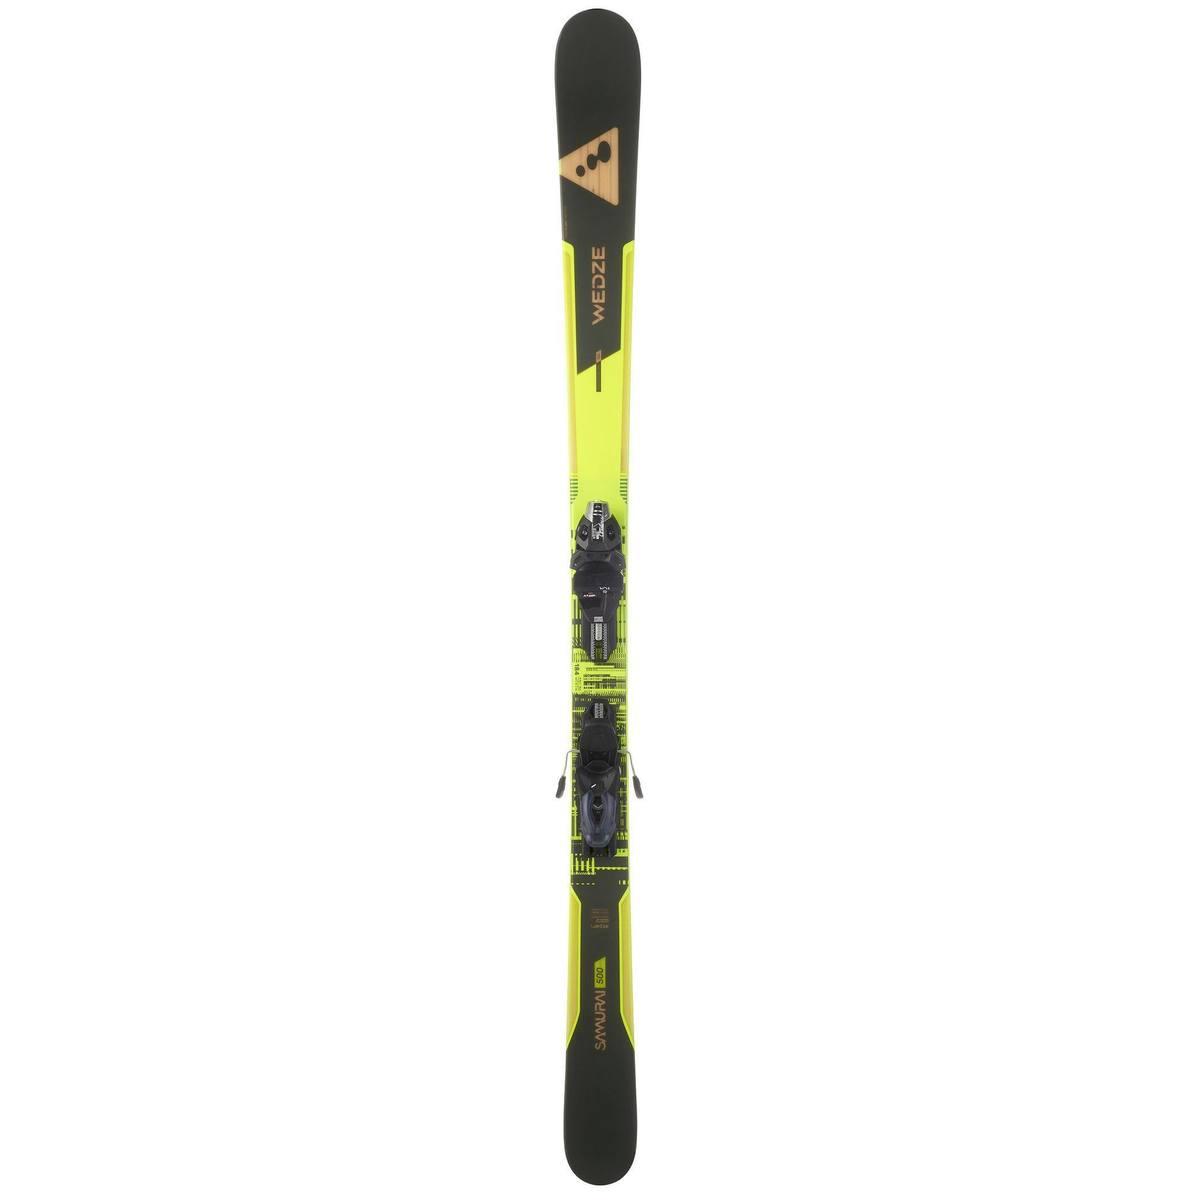 Bild 2 von Ski Freeride Samurai 500 gelb